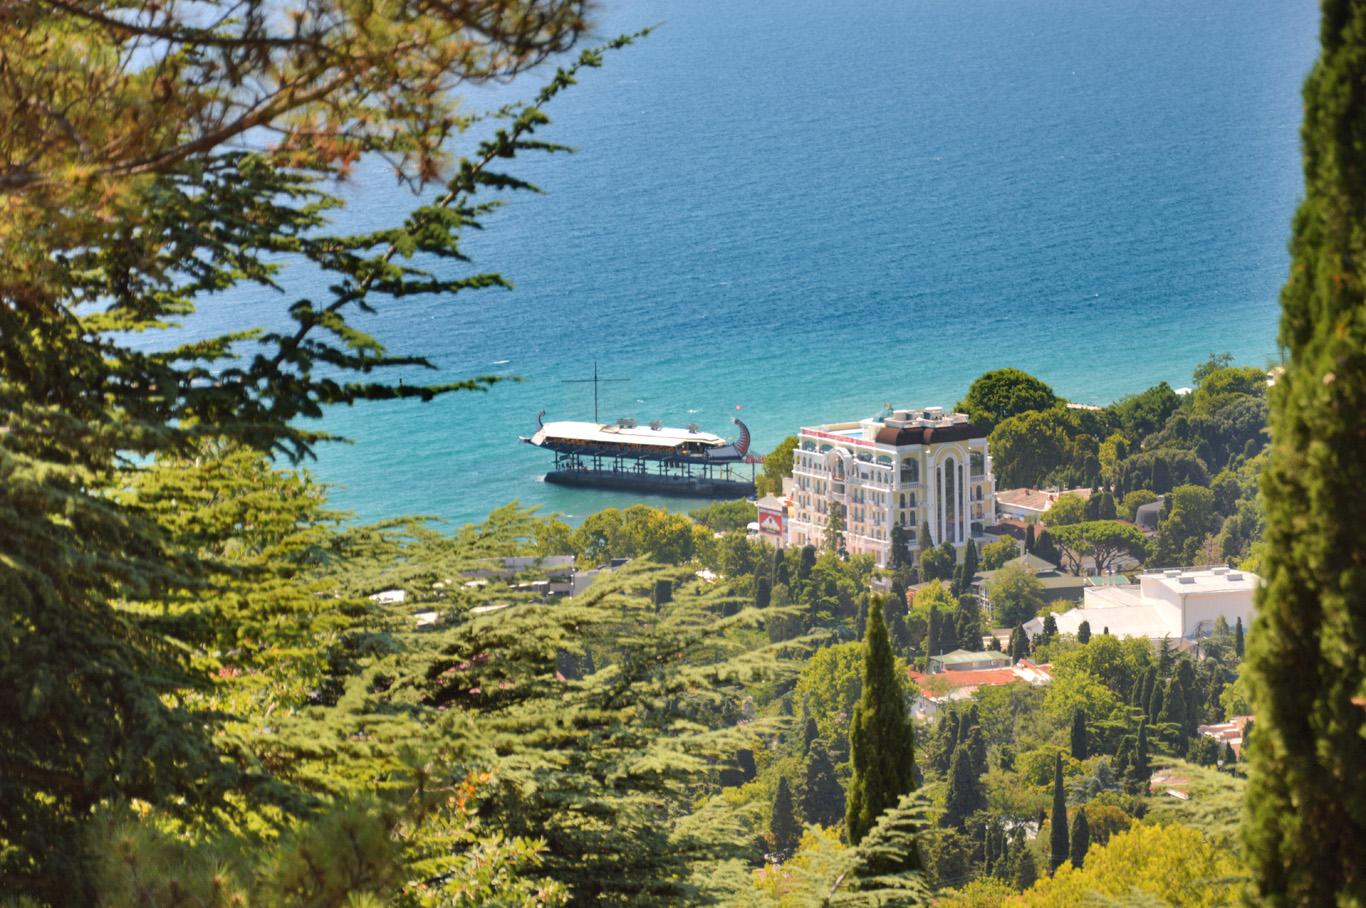 Black sea and the ship-restaurant